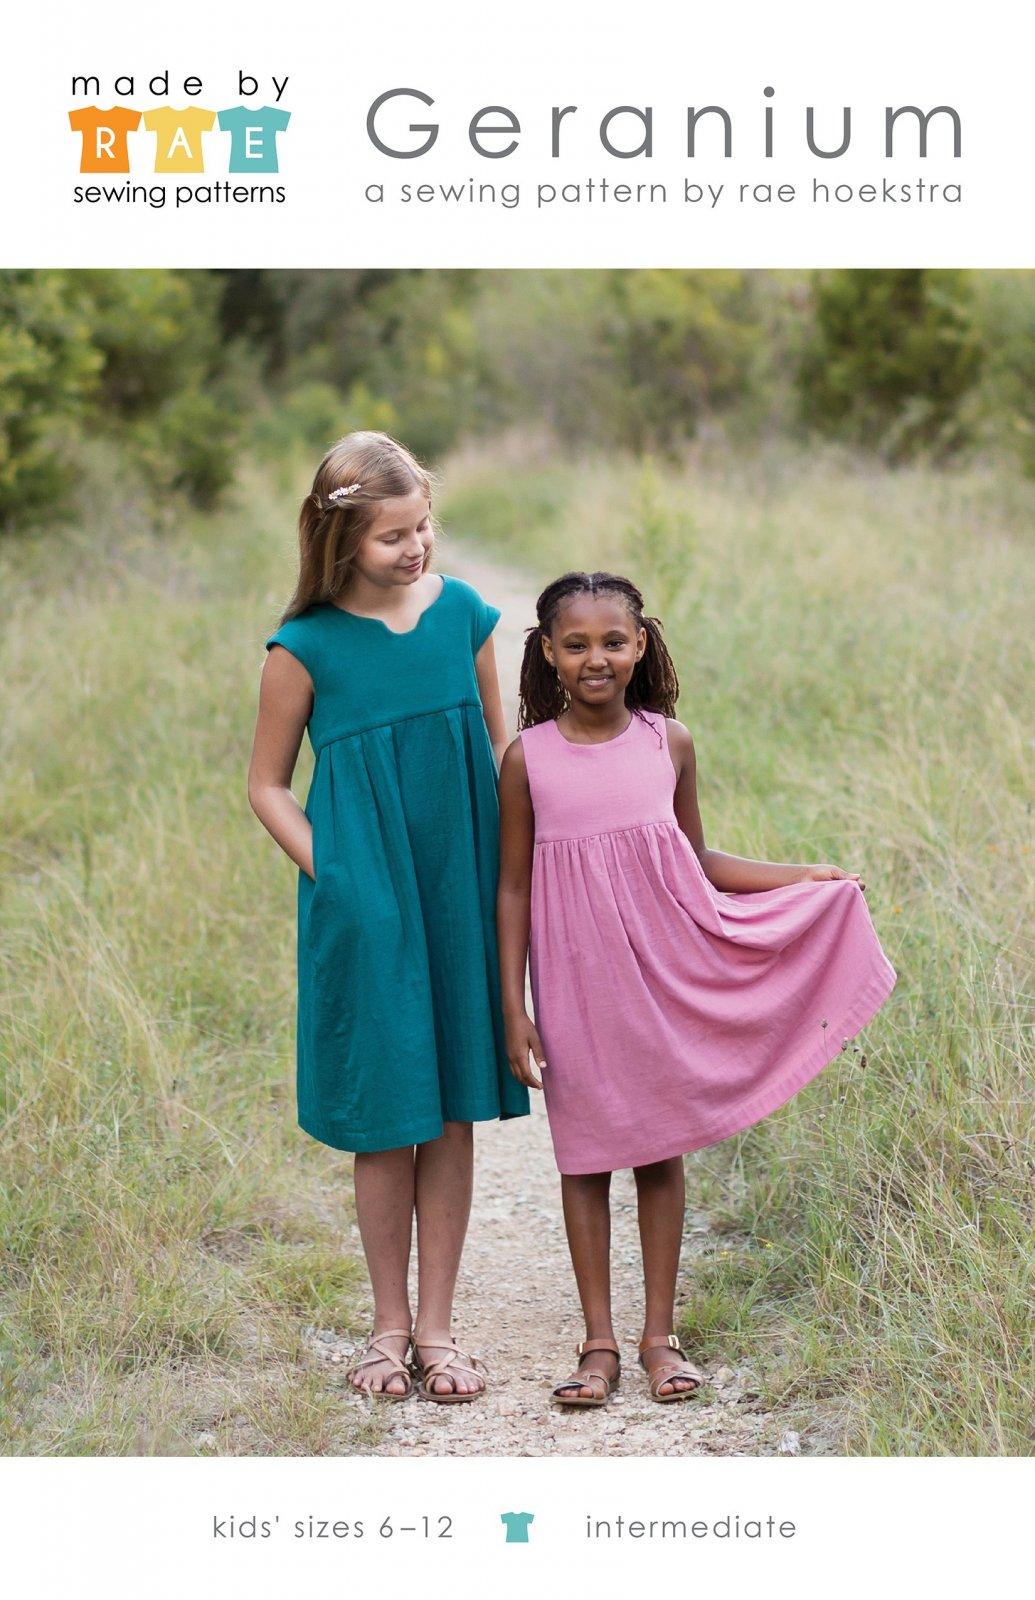 Geranium Dress Pattern - Sizes 6-12 - Made By Rae